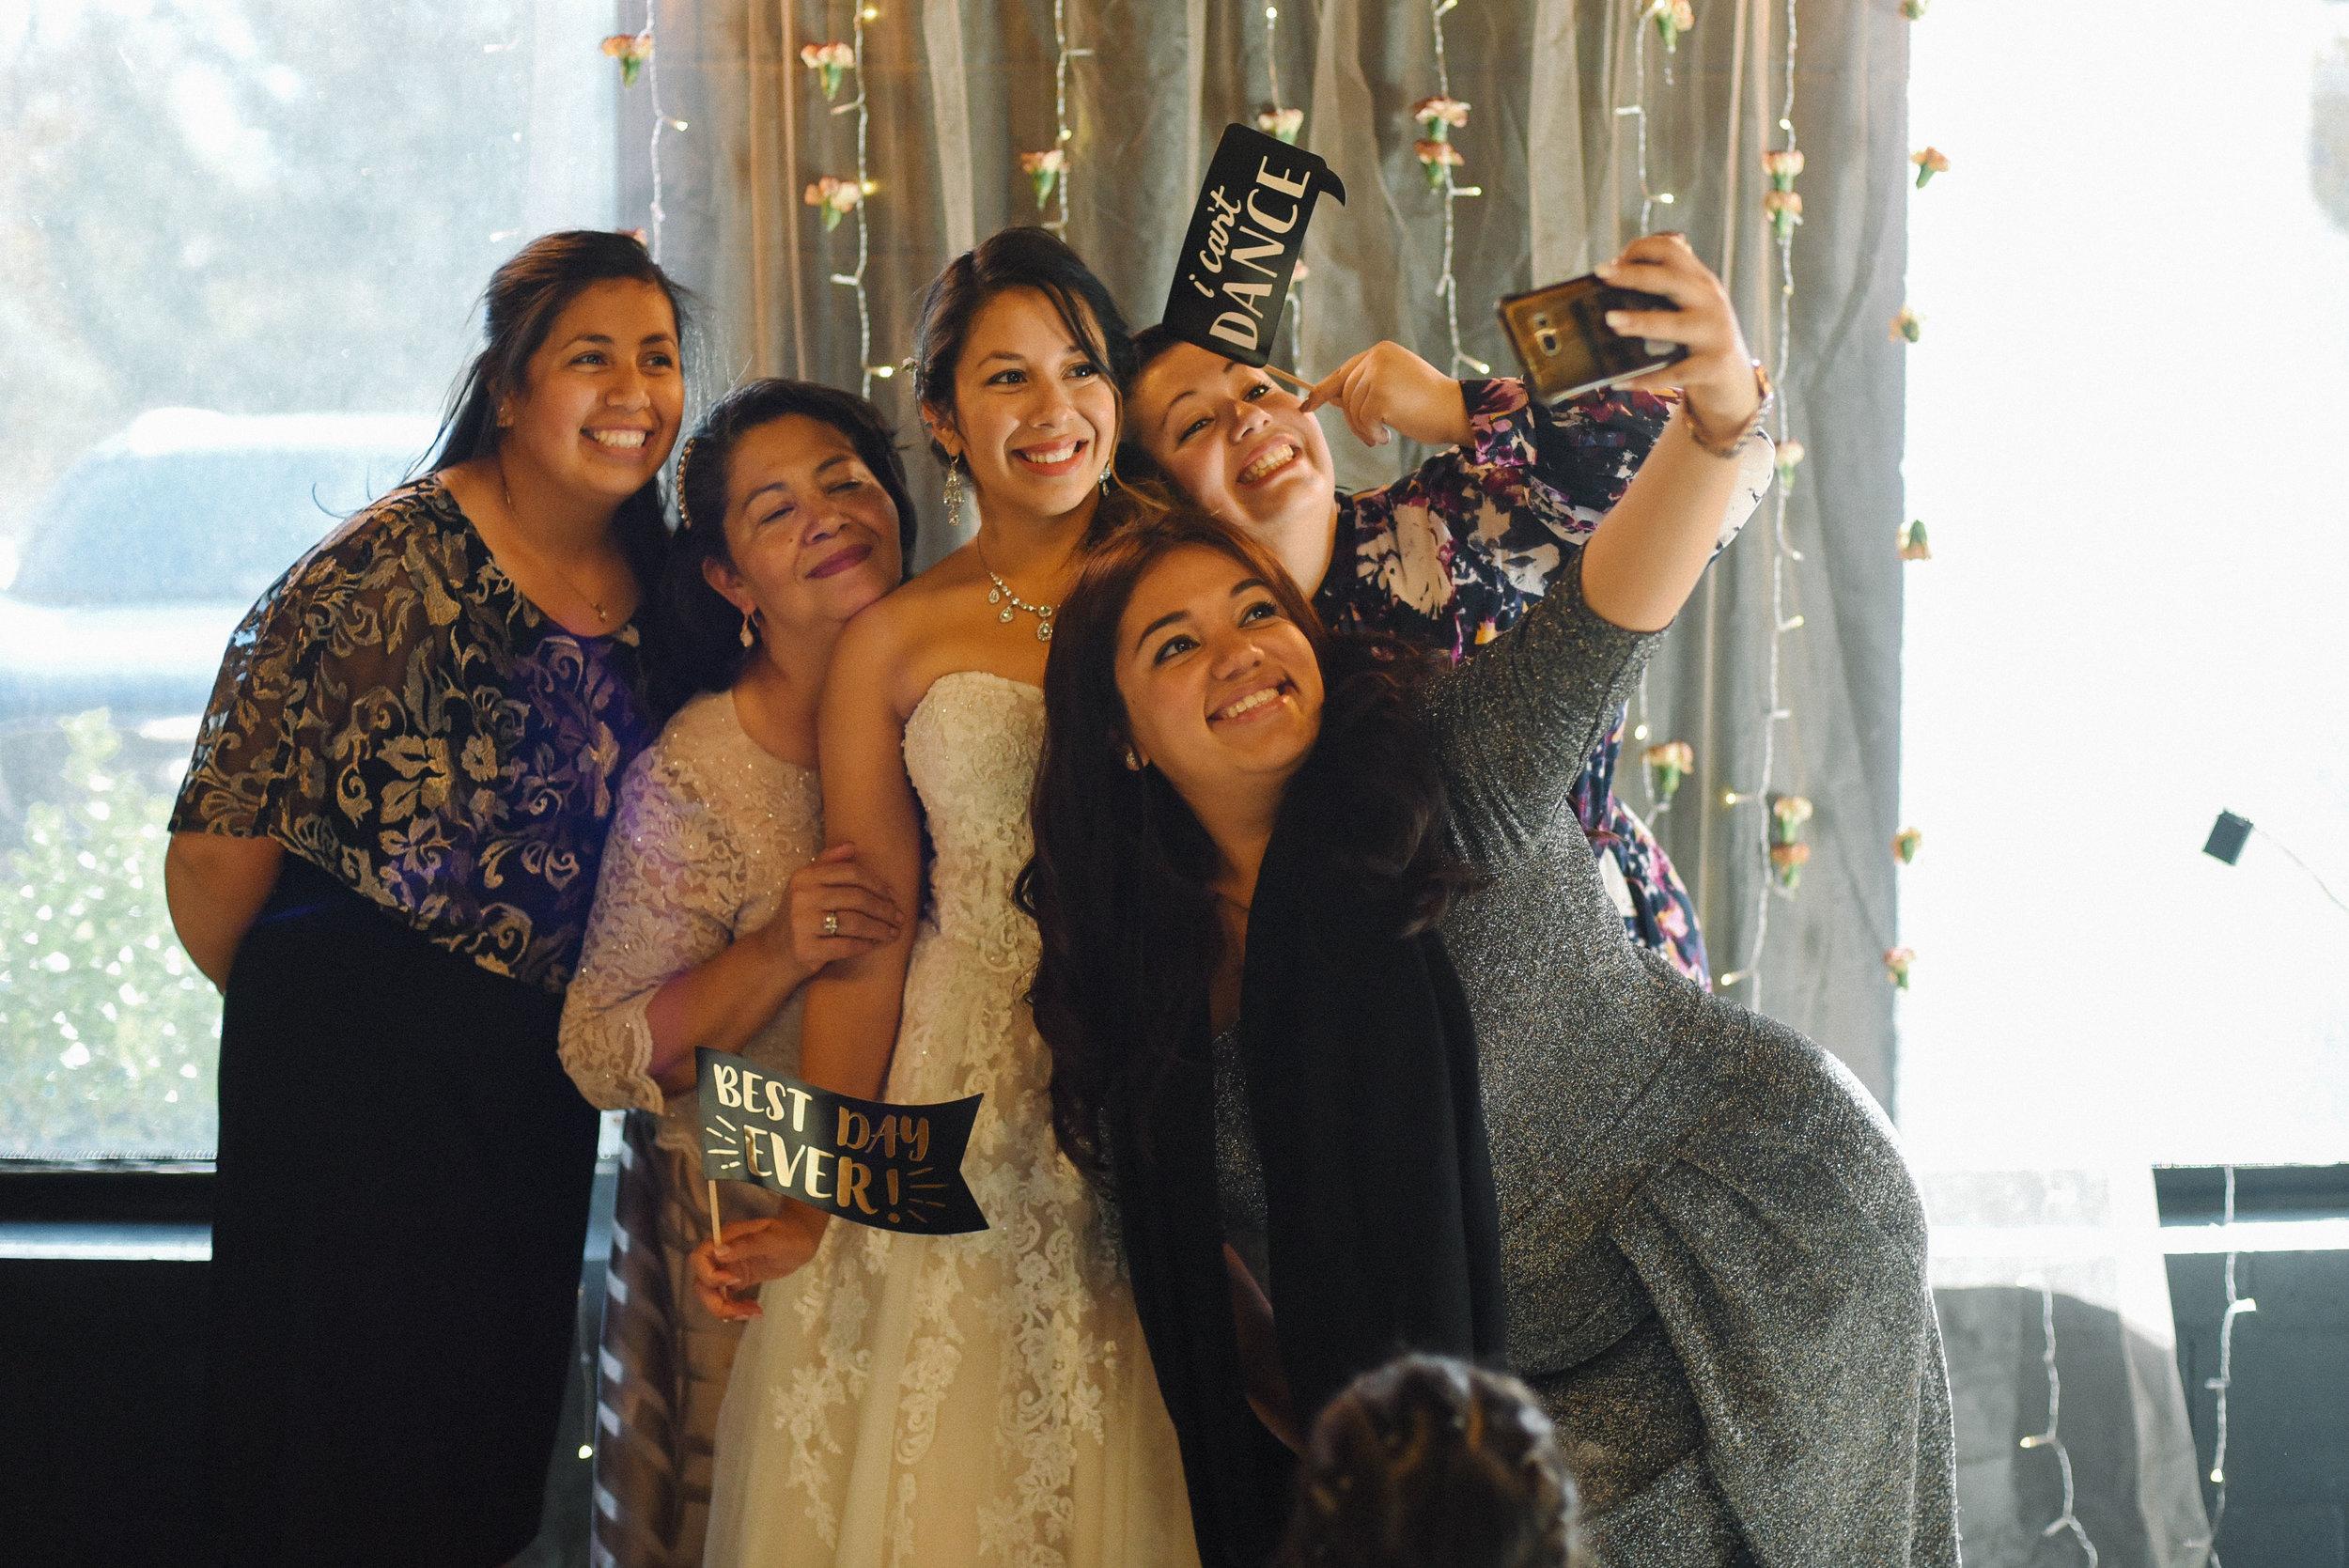 maryland_wedding_photographer_jailbreak_brewing-9.jpg